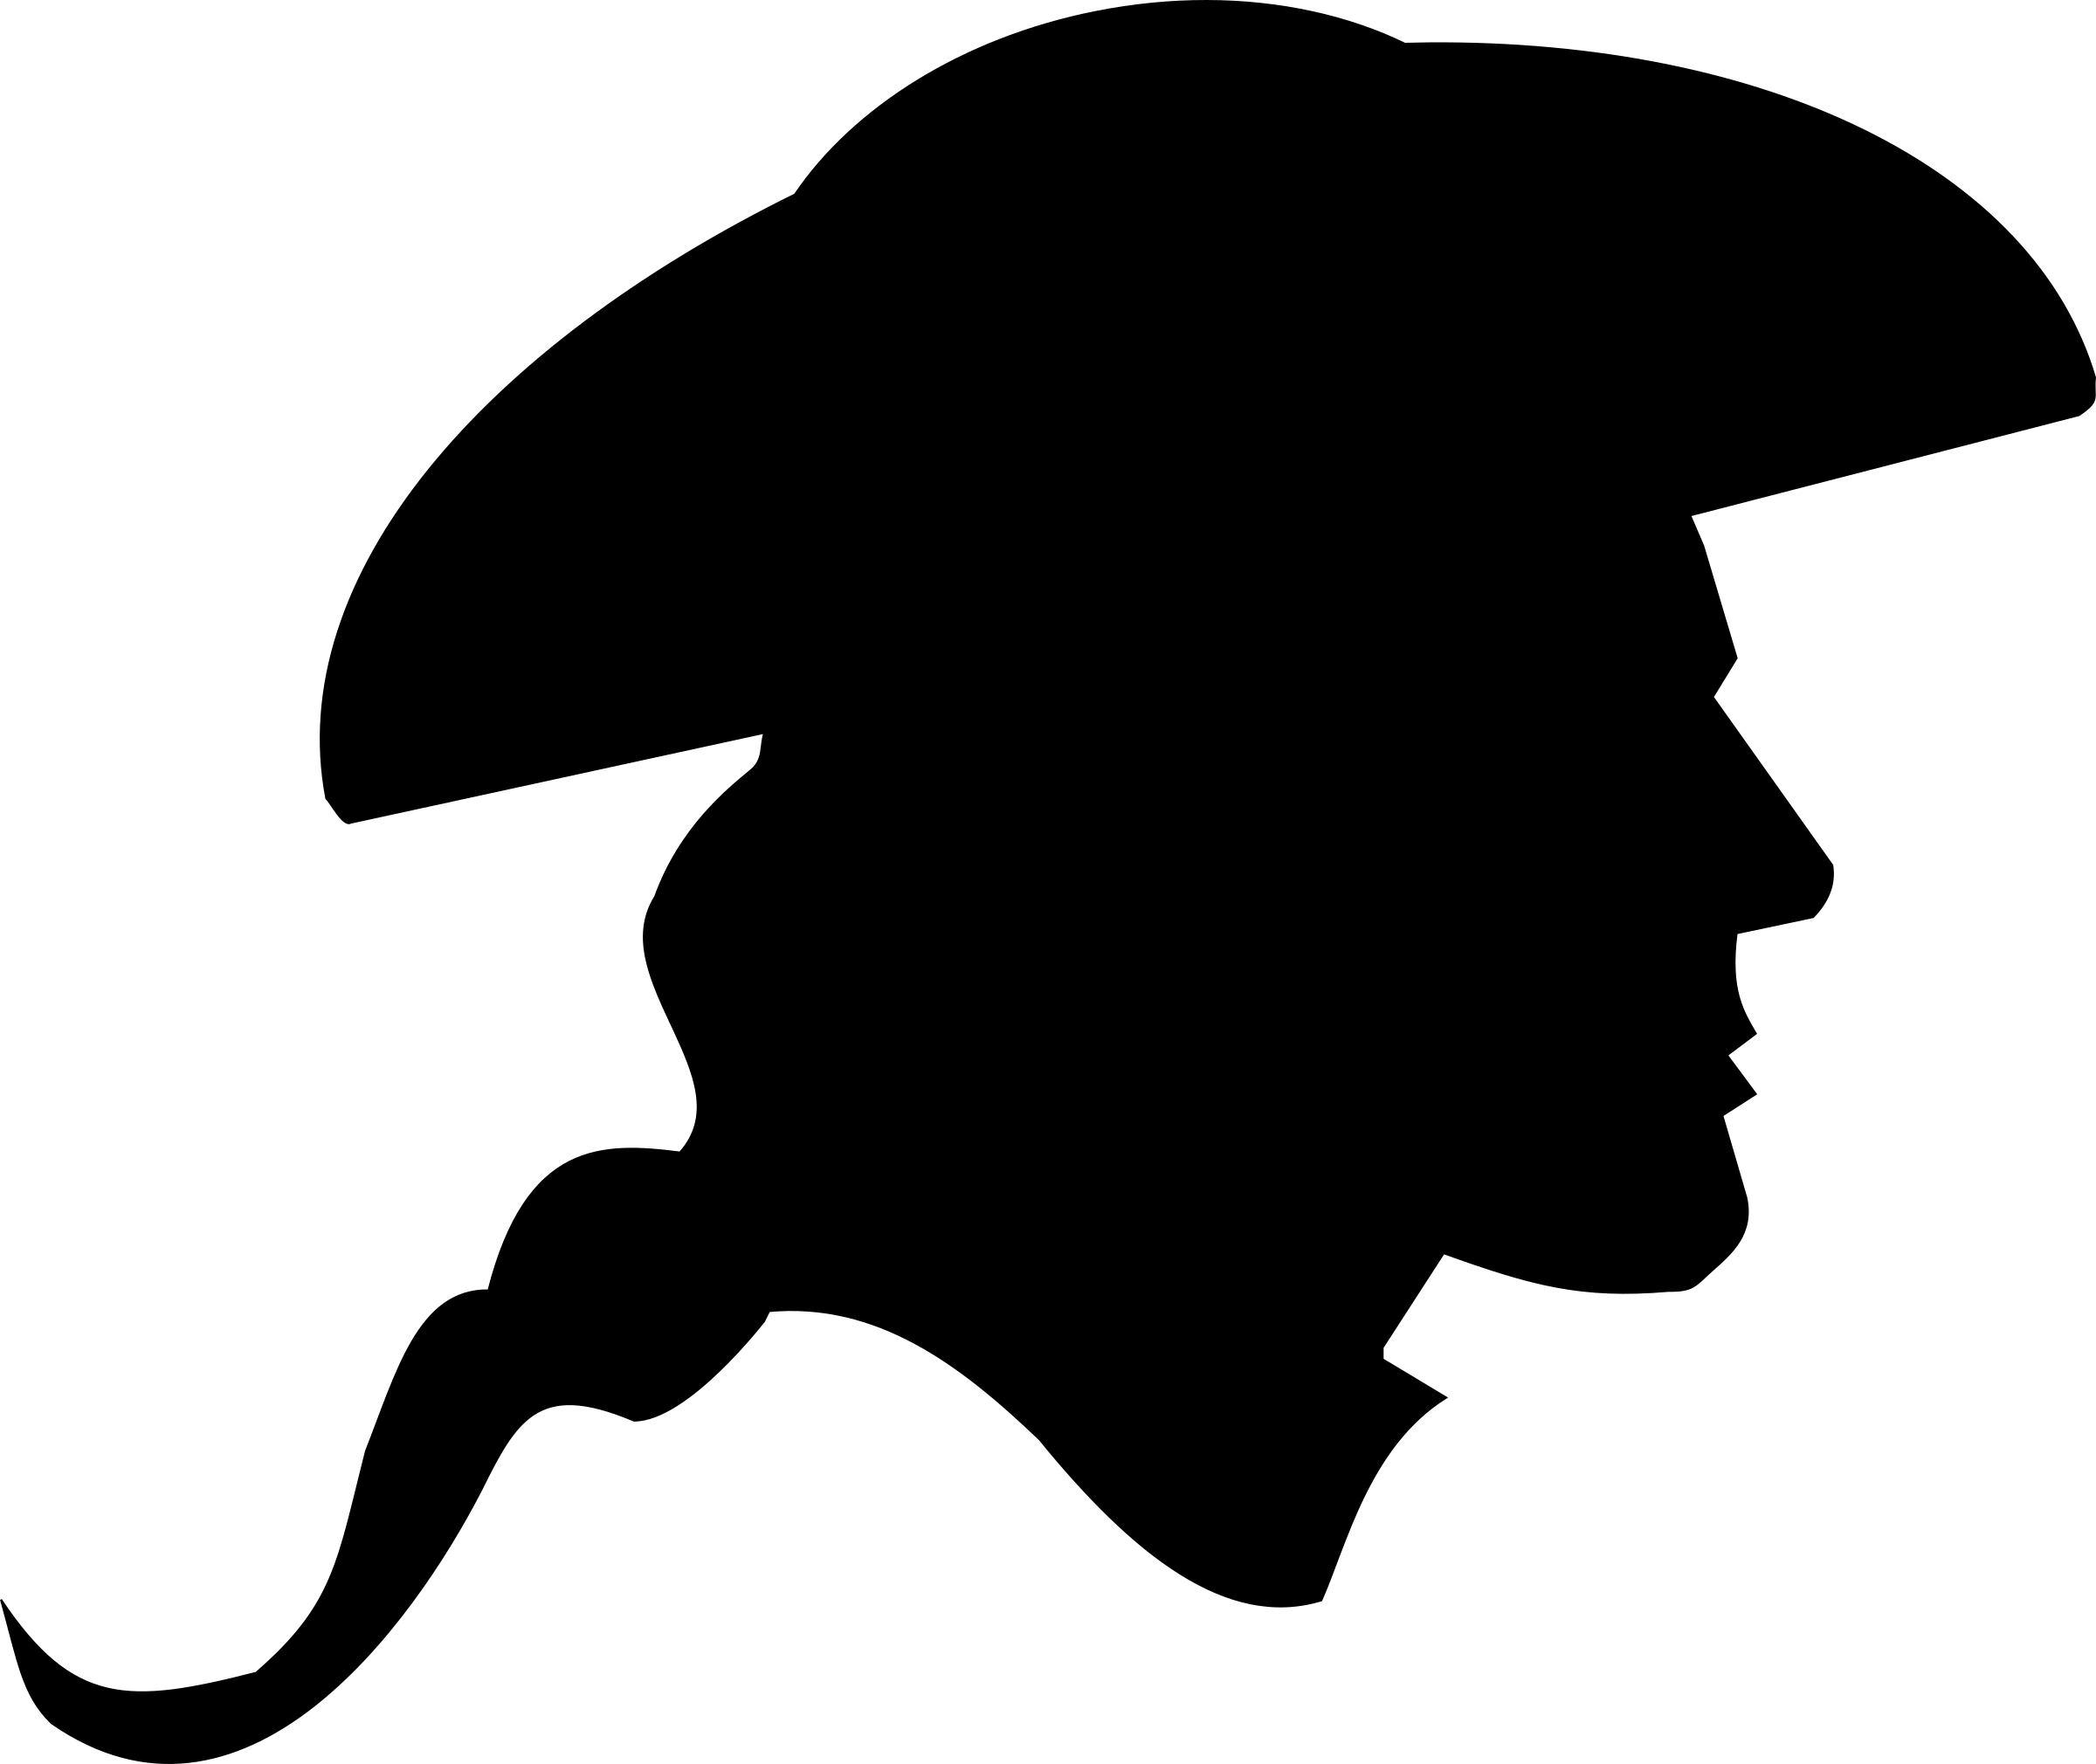 2400x2020 Clipart